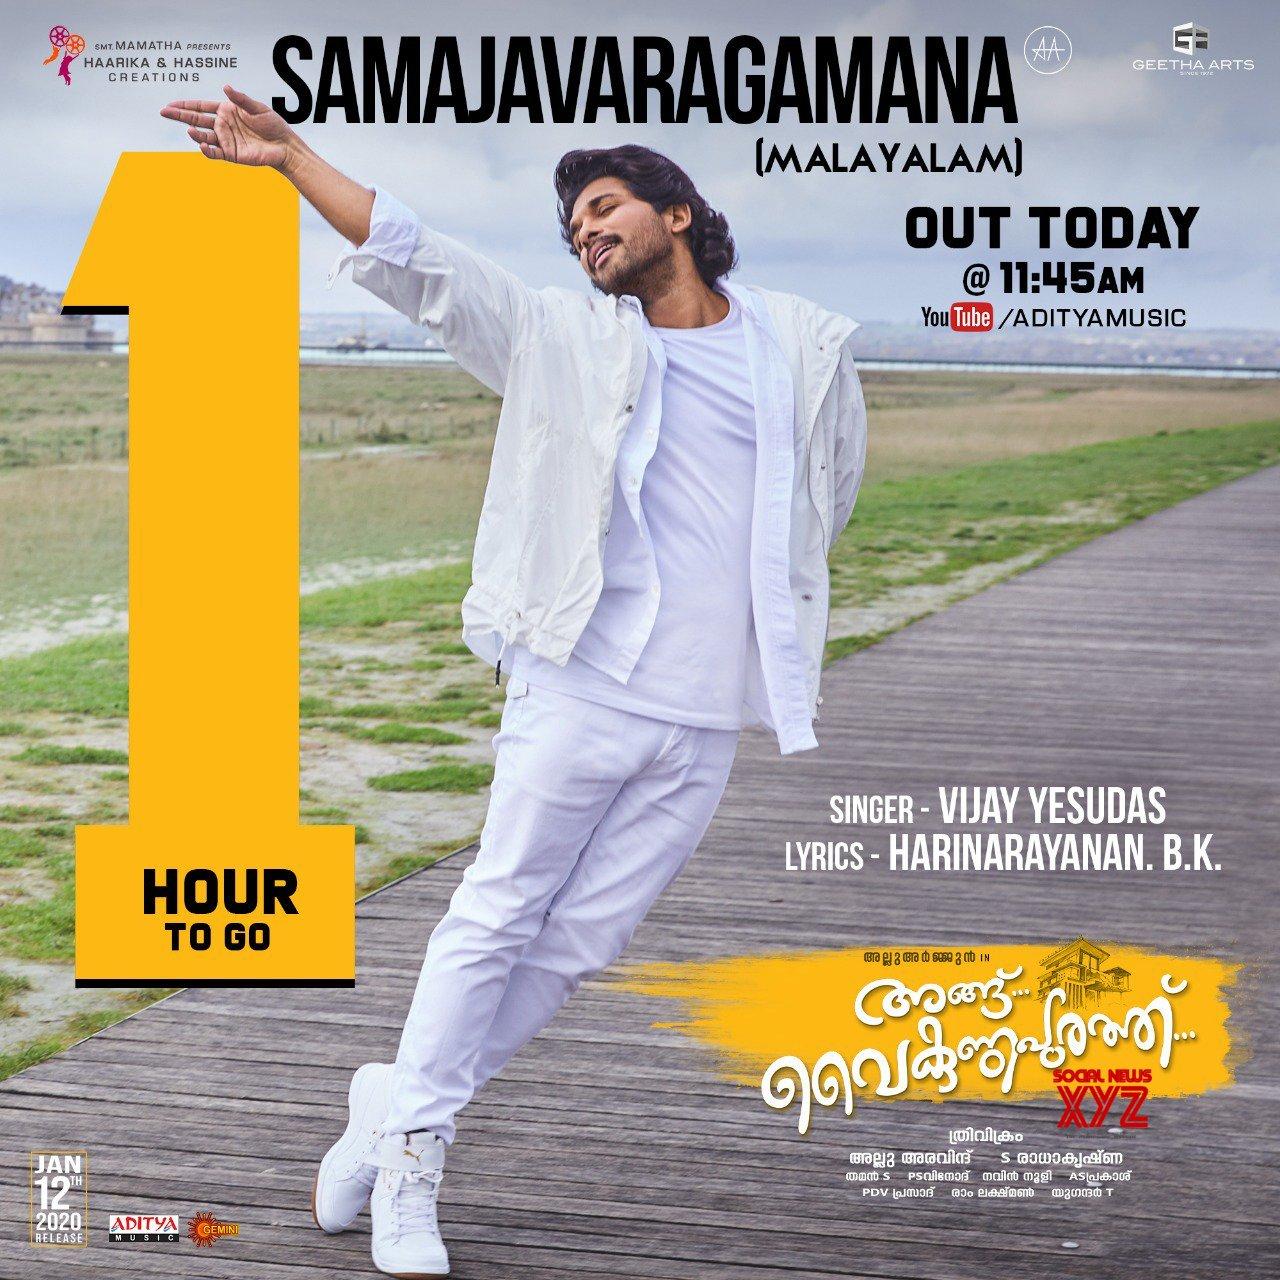 Samajavaragamana Malayalam Version From Angu Vaikuntapurathu Will Be Our In 1 Hour